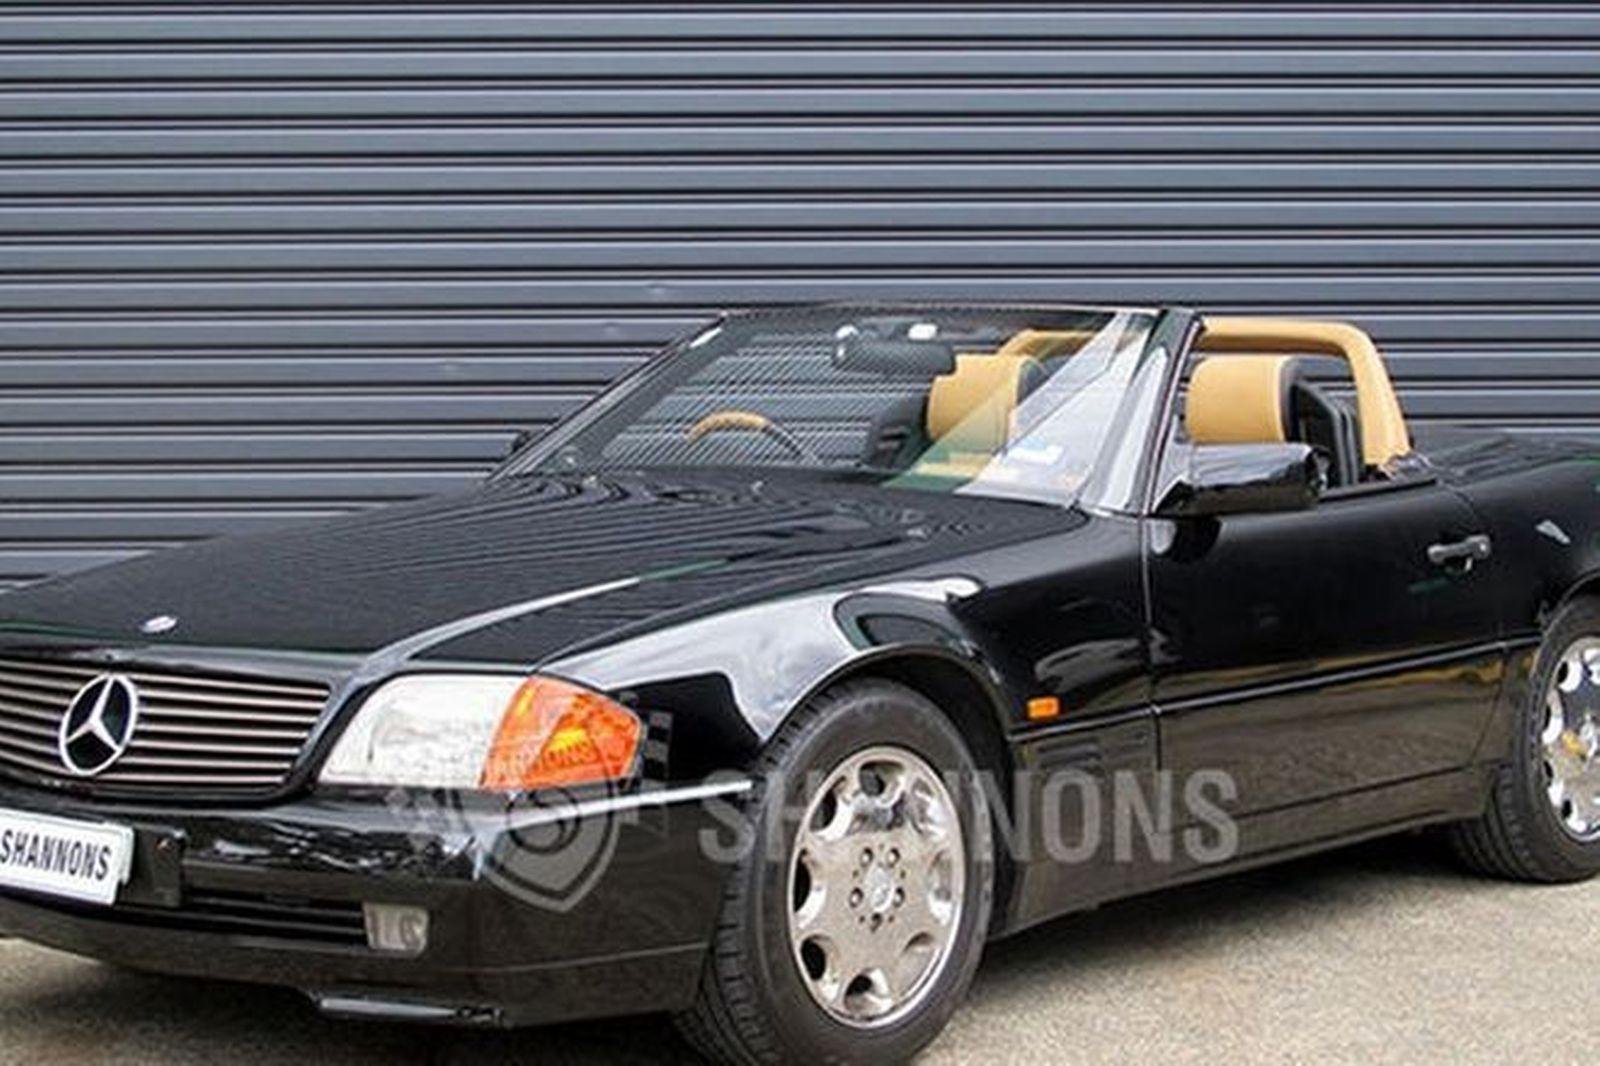 sold mercedes benz 500sl convertible auctions lot 6 shannons. Black Bedroom Furniture Sets. Home Design Ideas